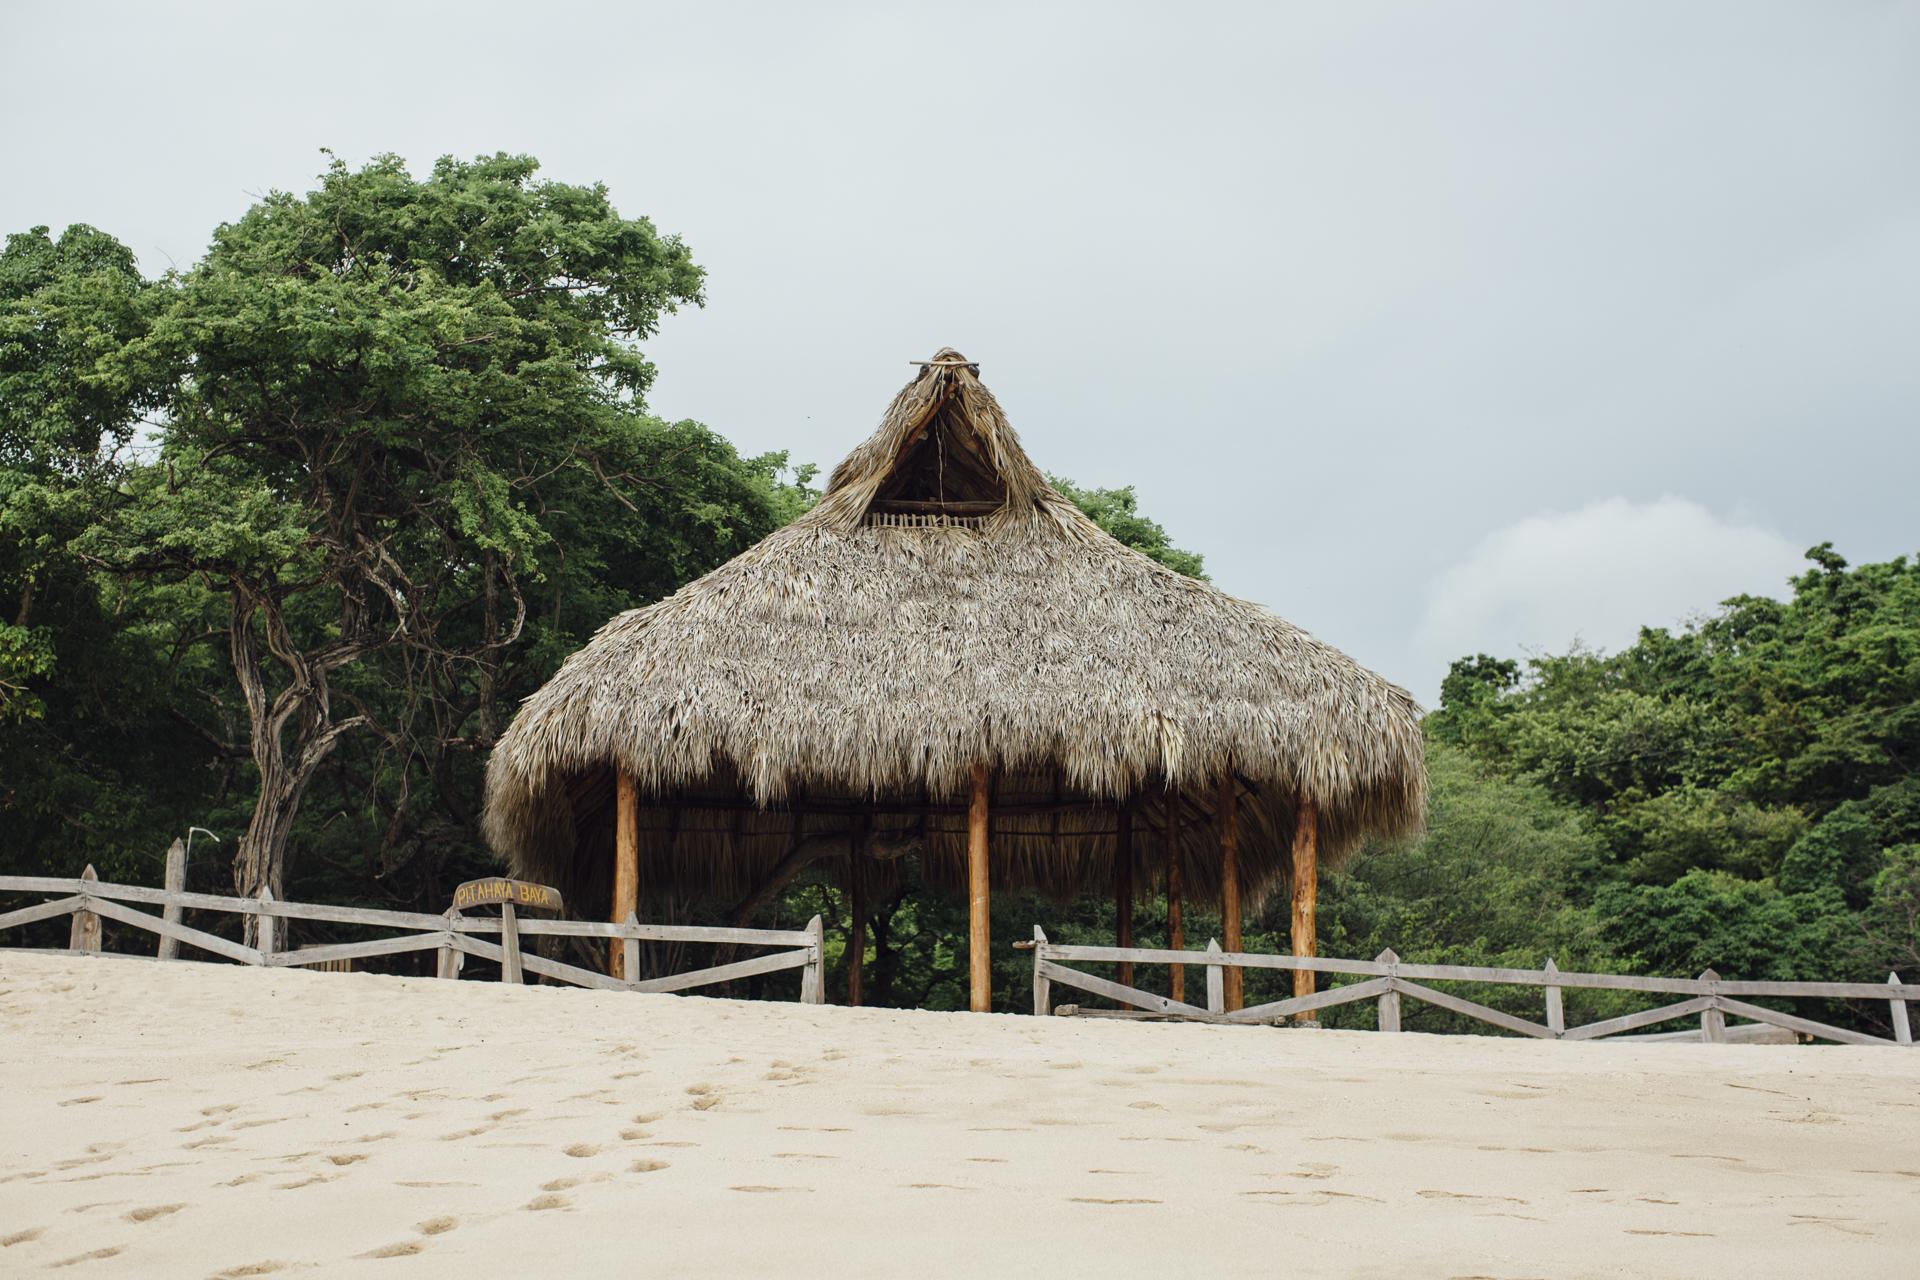 160705_MADERAS-VILLAGE-NICARAGUA-card-6-0239.jpg